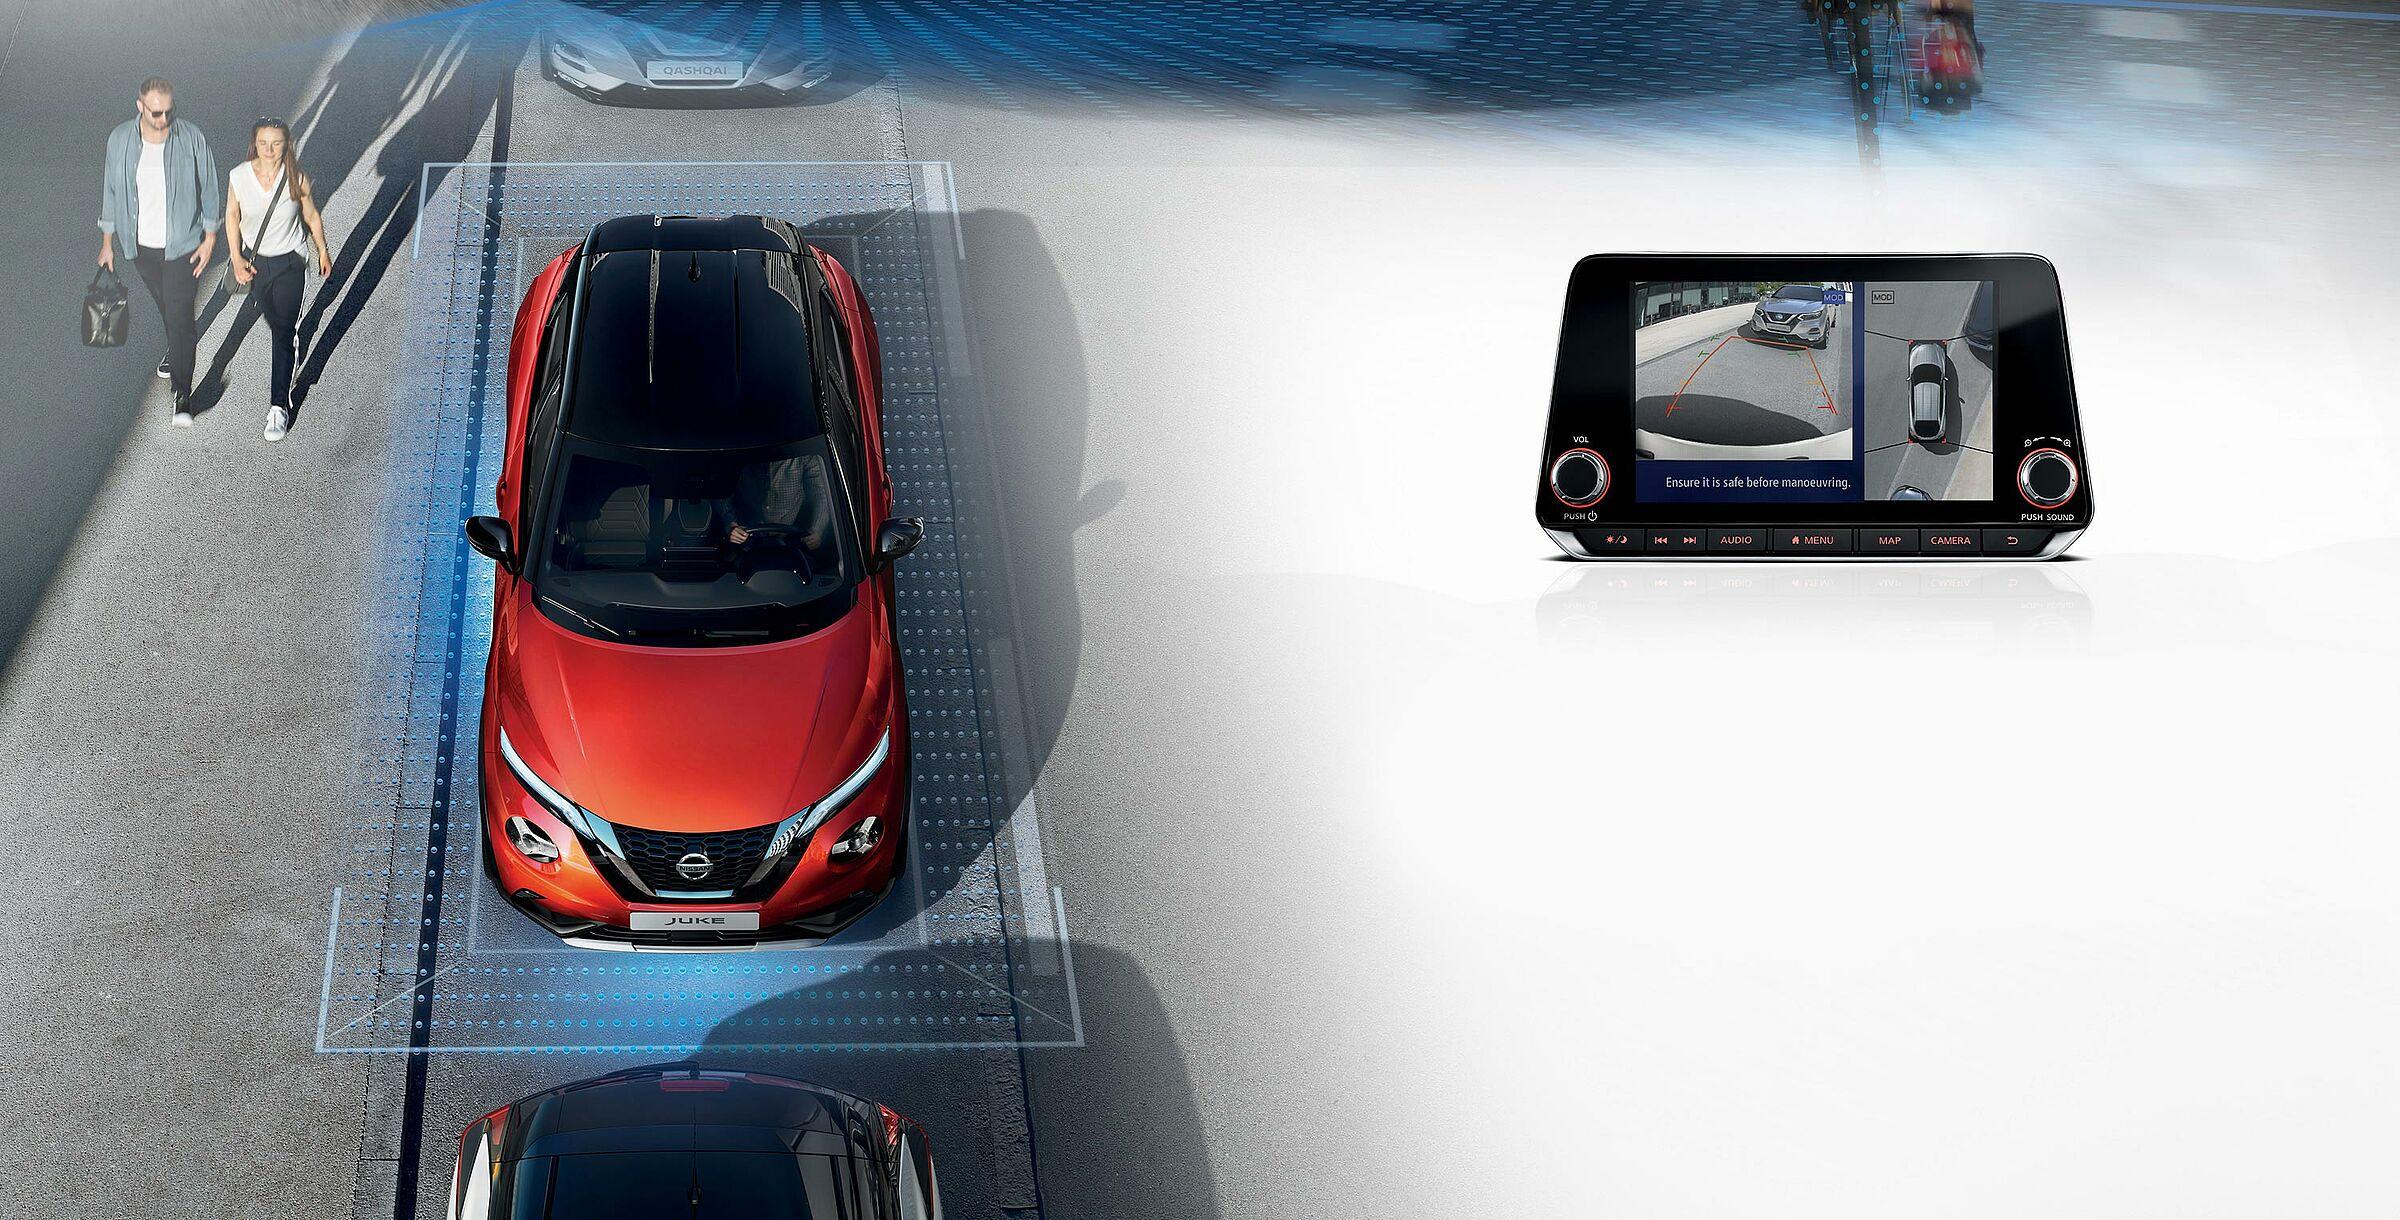 Nissan Juke Autozentren P&A-GmbH